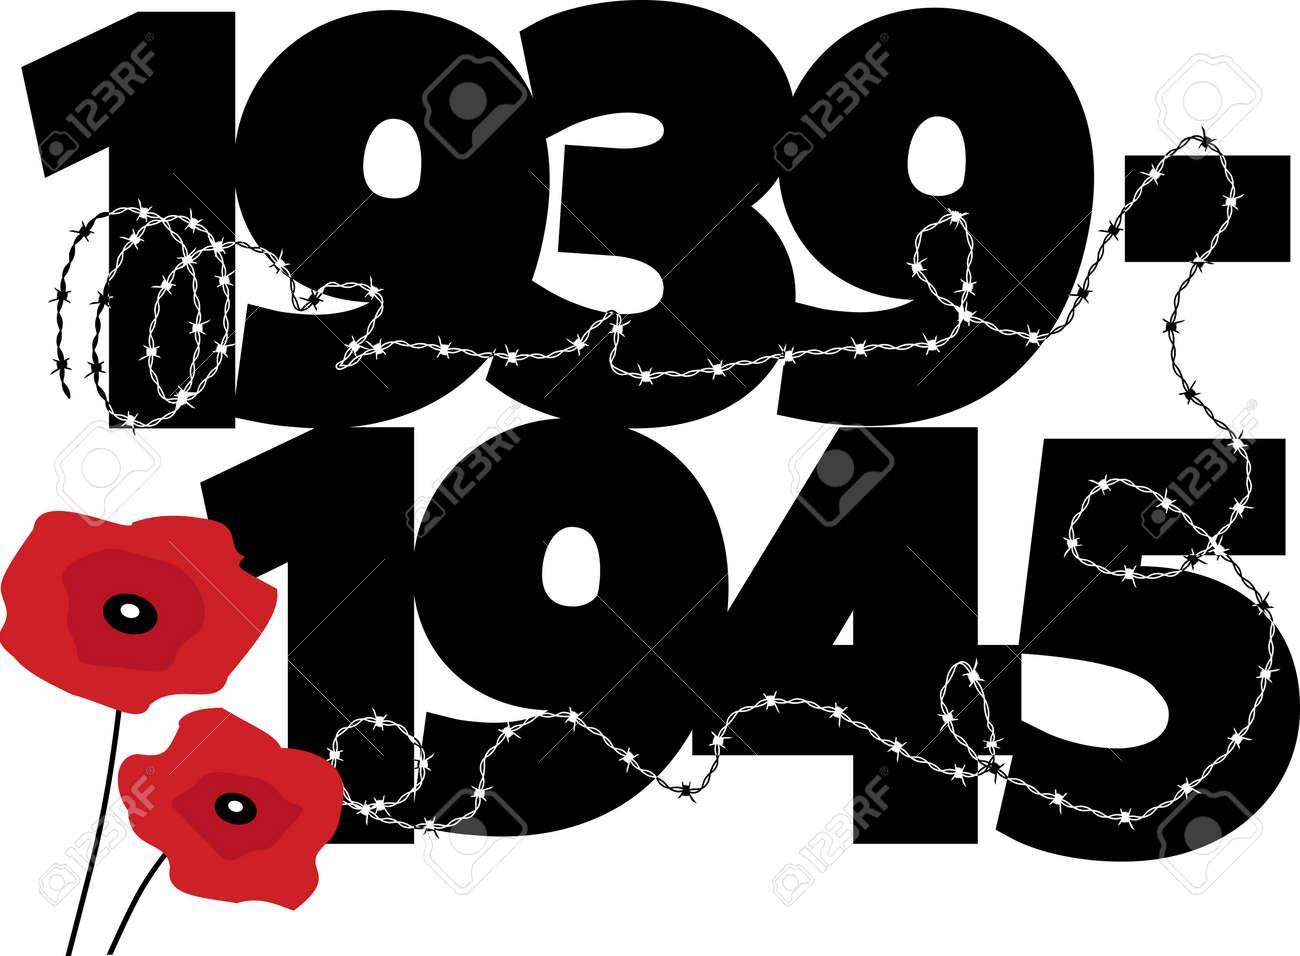 0 World War 2 Cliparts, Stock Vector And Royalty Free World War 2 ...